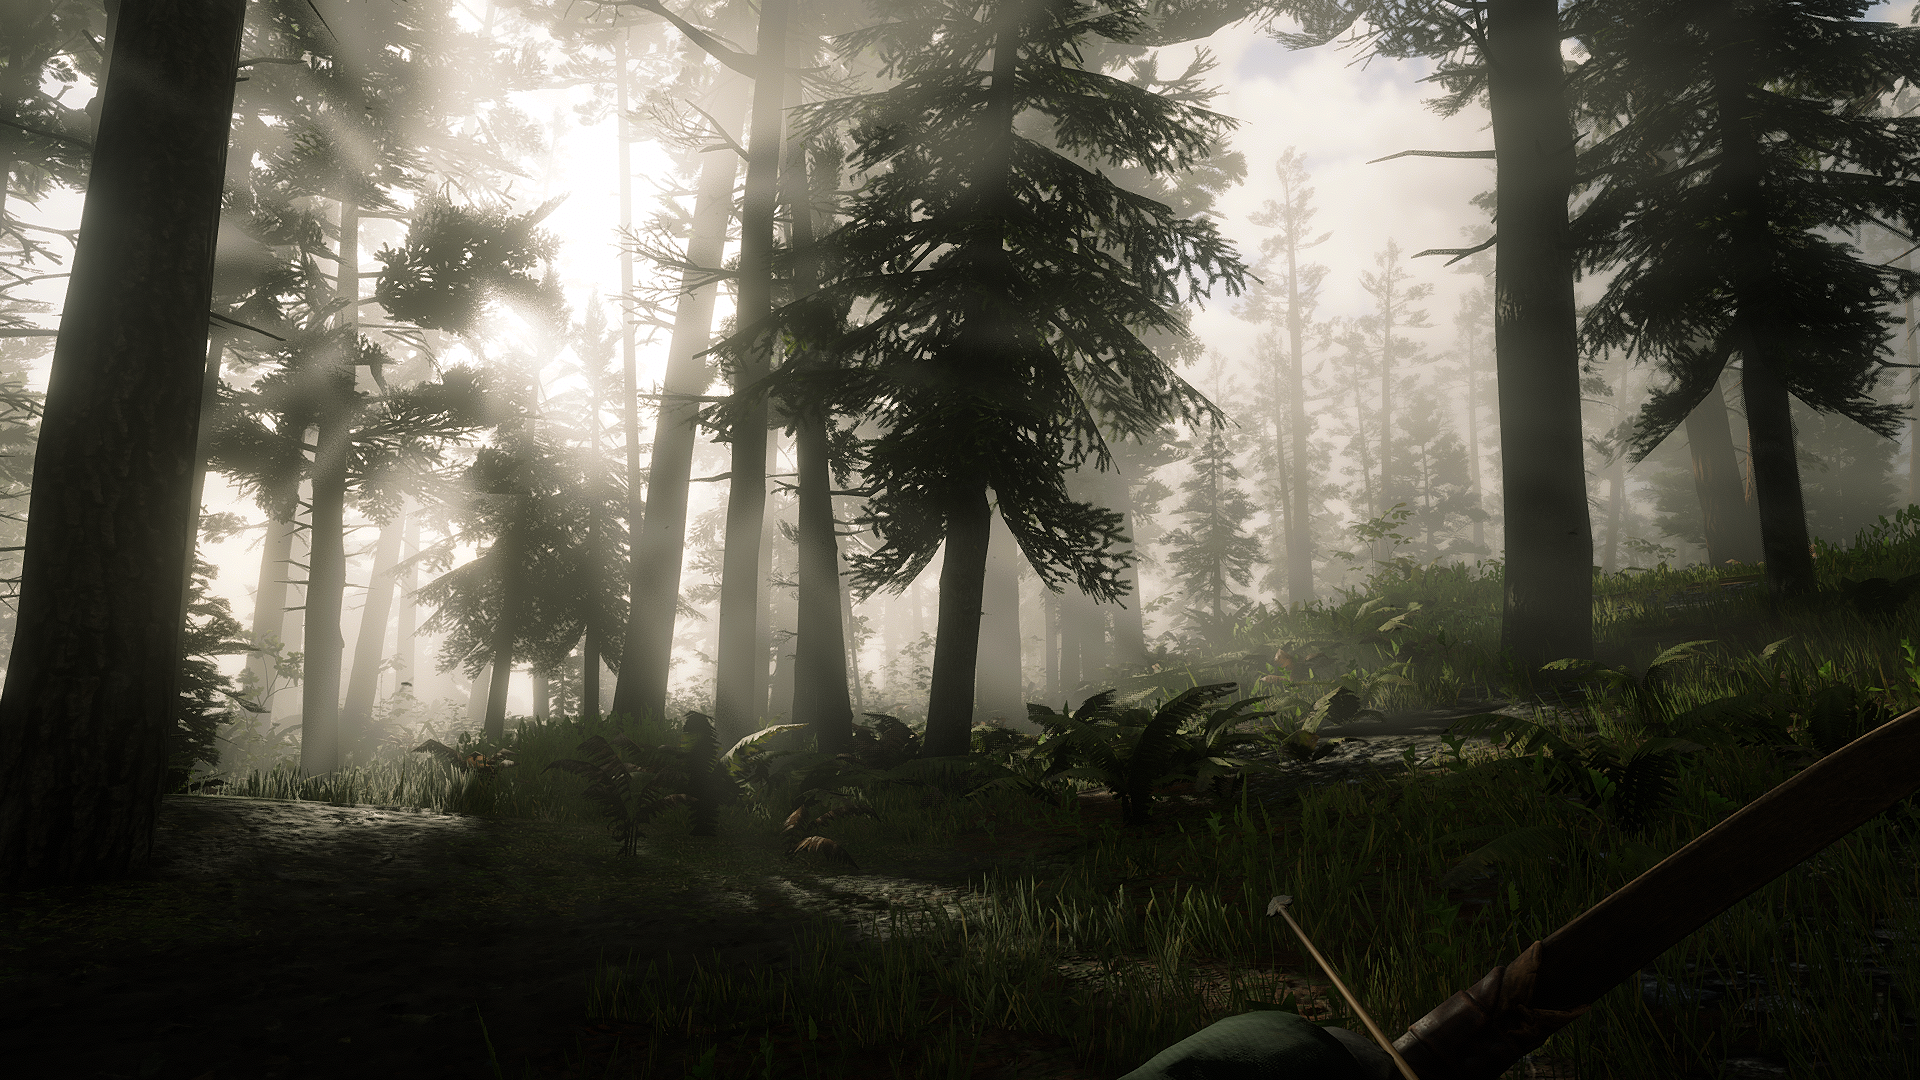 Red Dead Redemption 2 Screenshot 2021.01.13 - 17.25.15.28.png - Red Dead Redemption 2